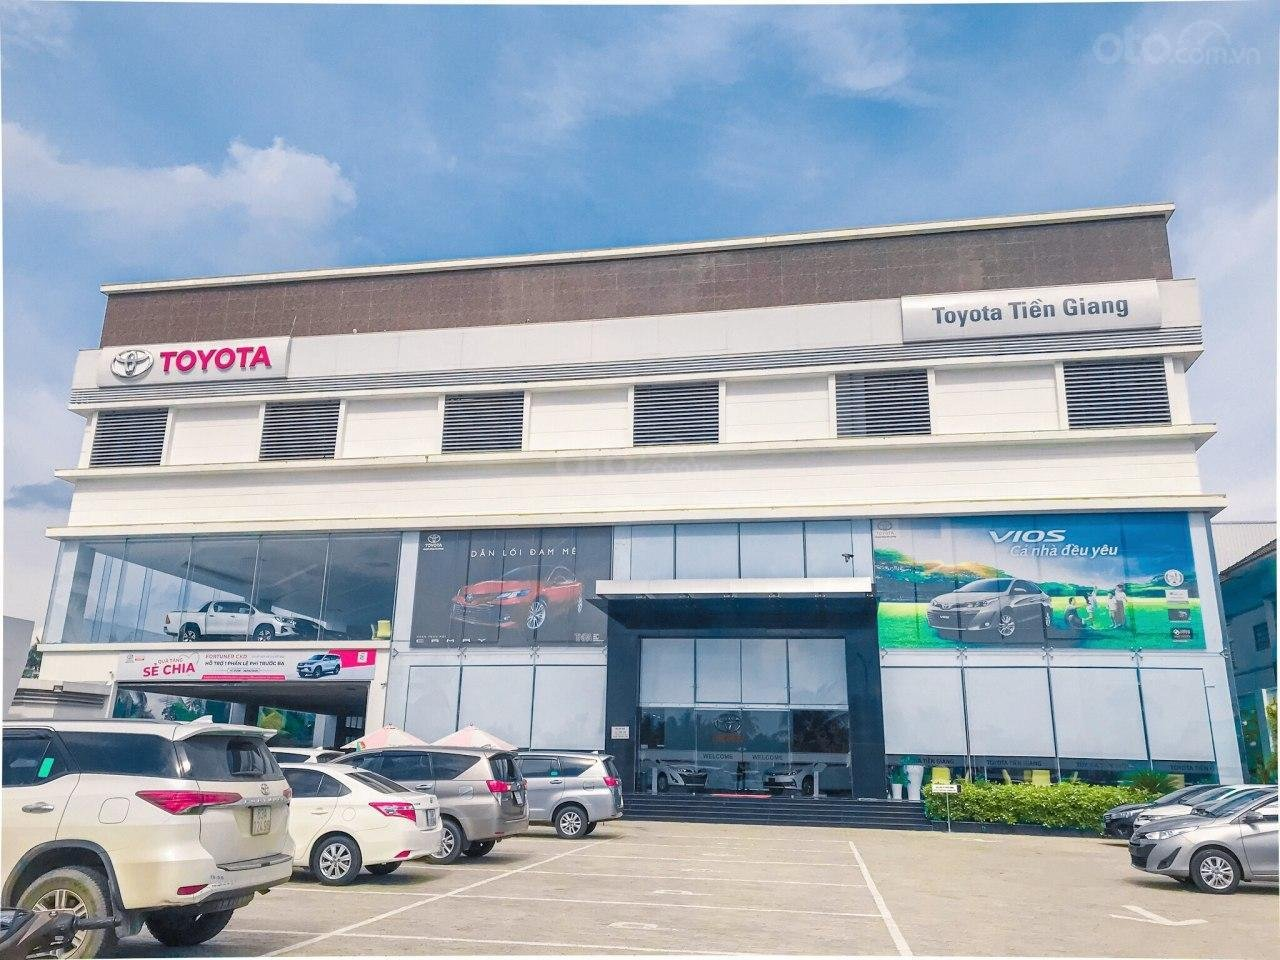 Toyota Tiền Giang (2)